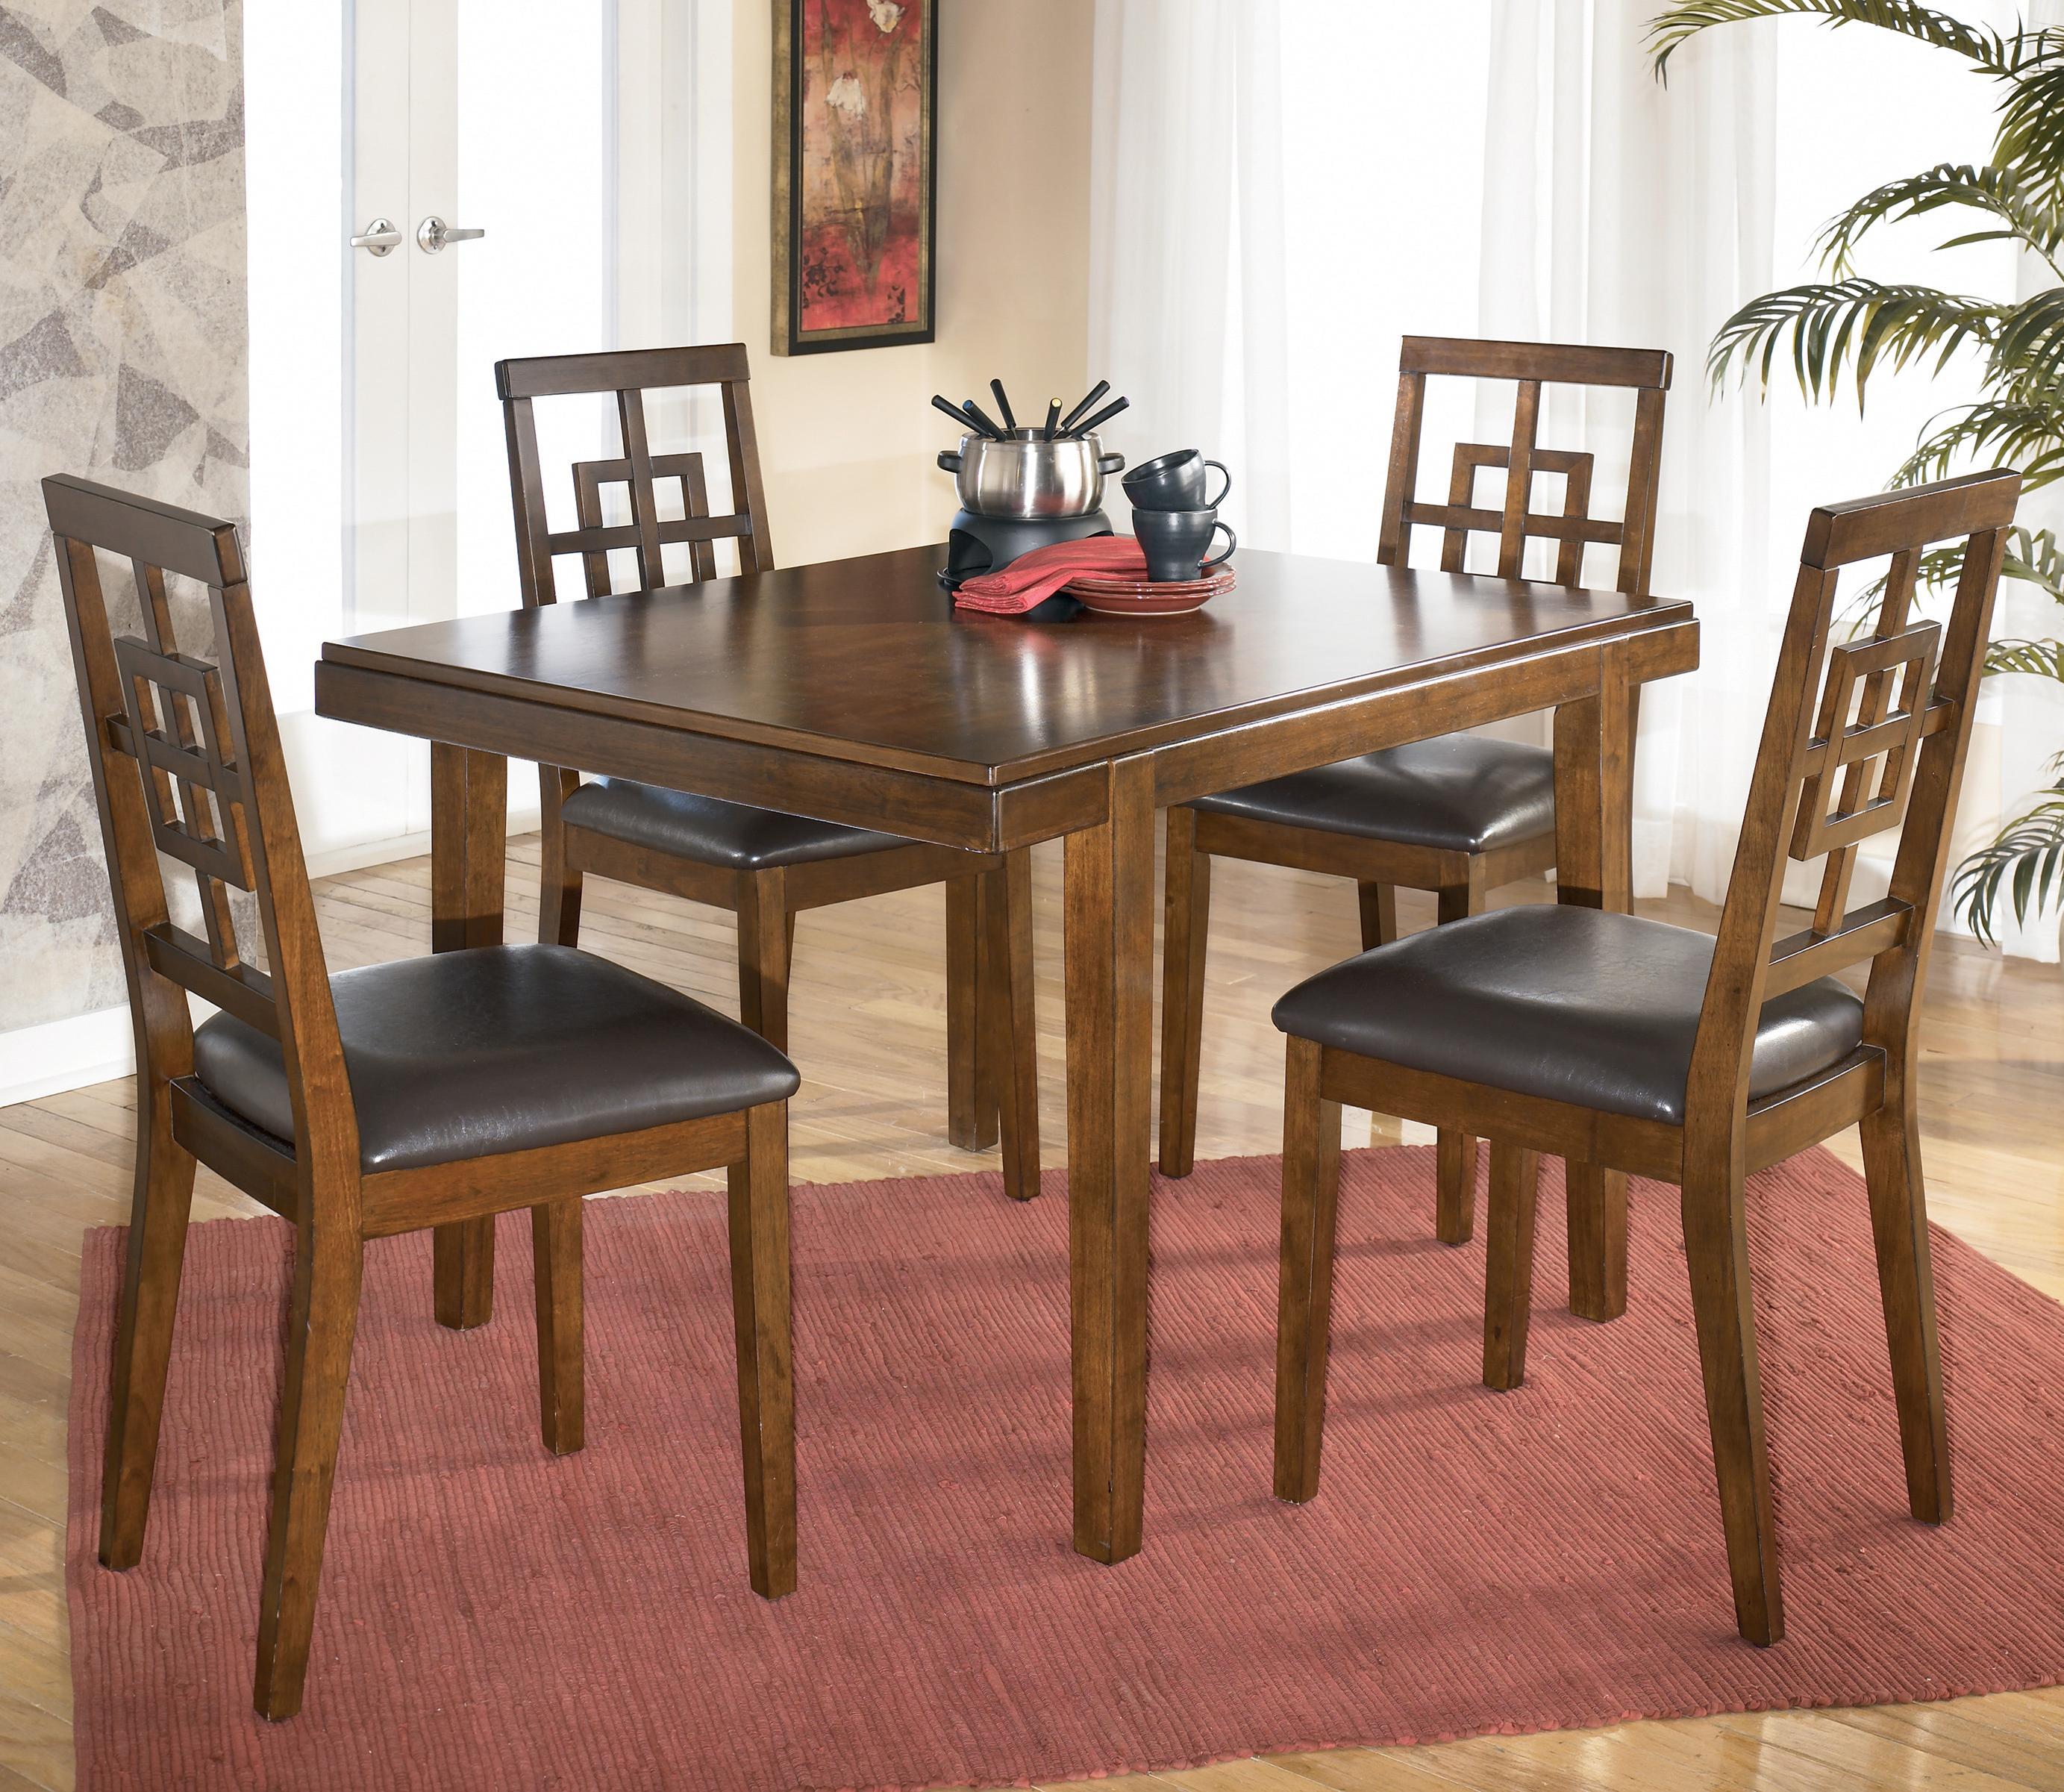 Ashley signature design cimeran d295 225 rectangular table for Table grid design